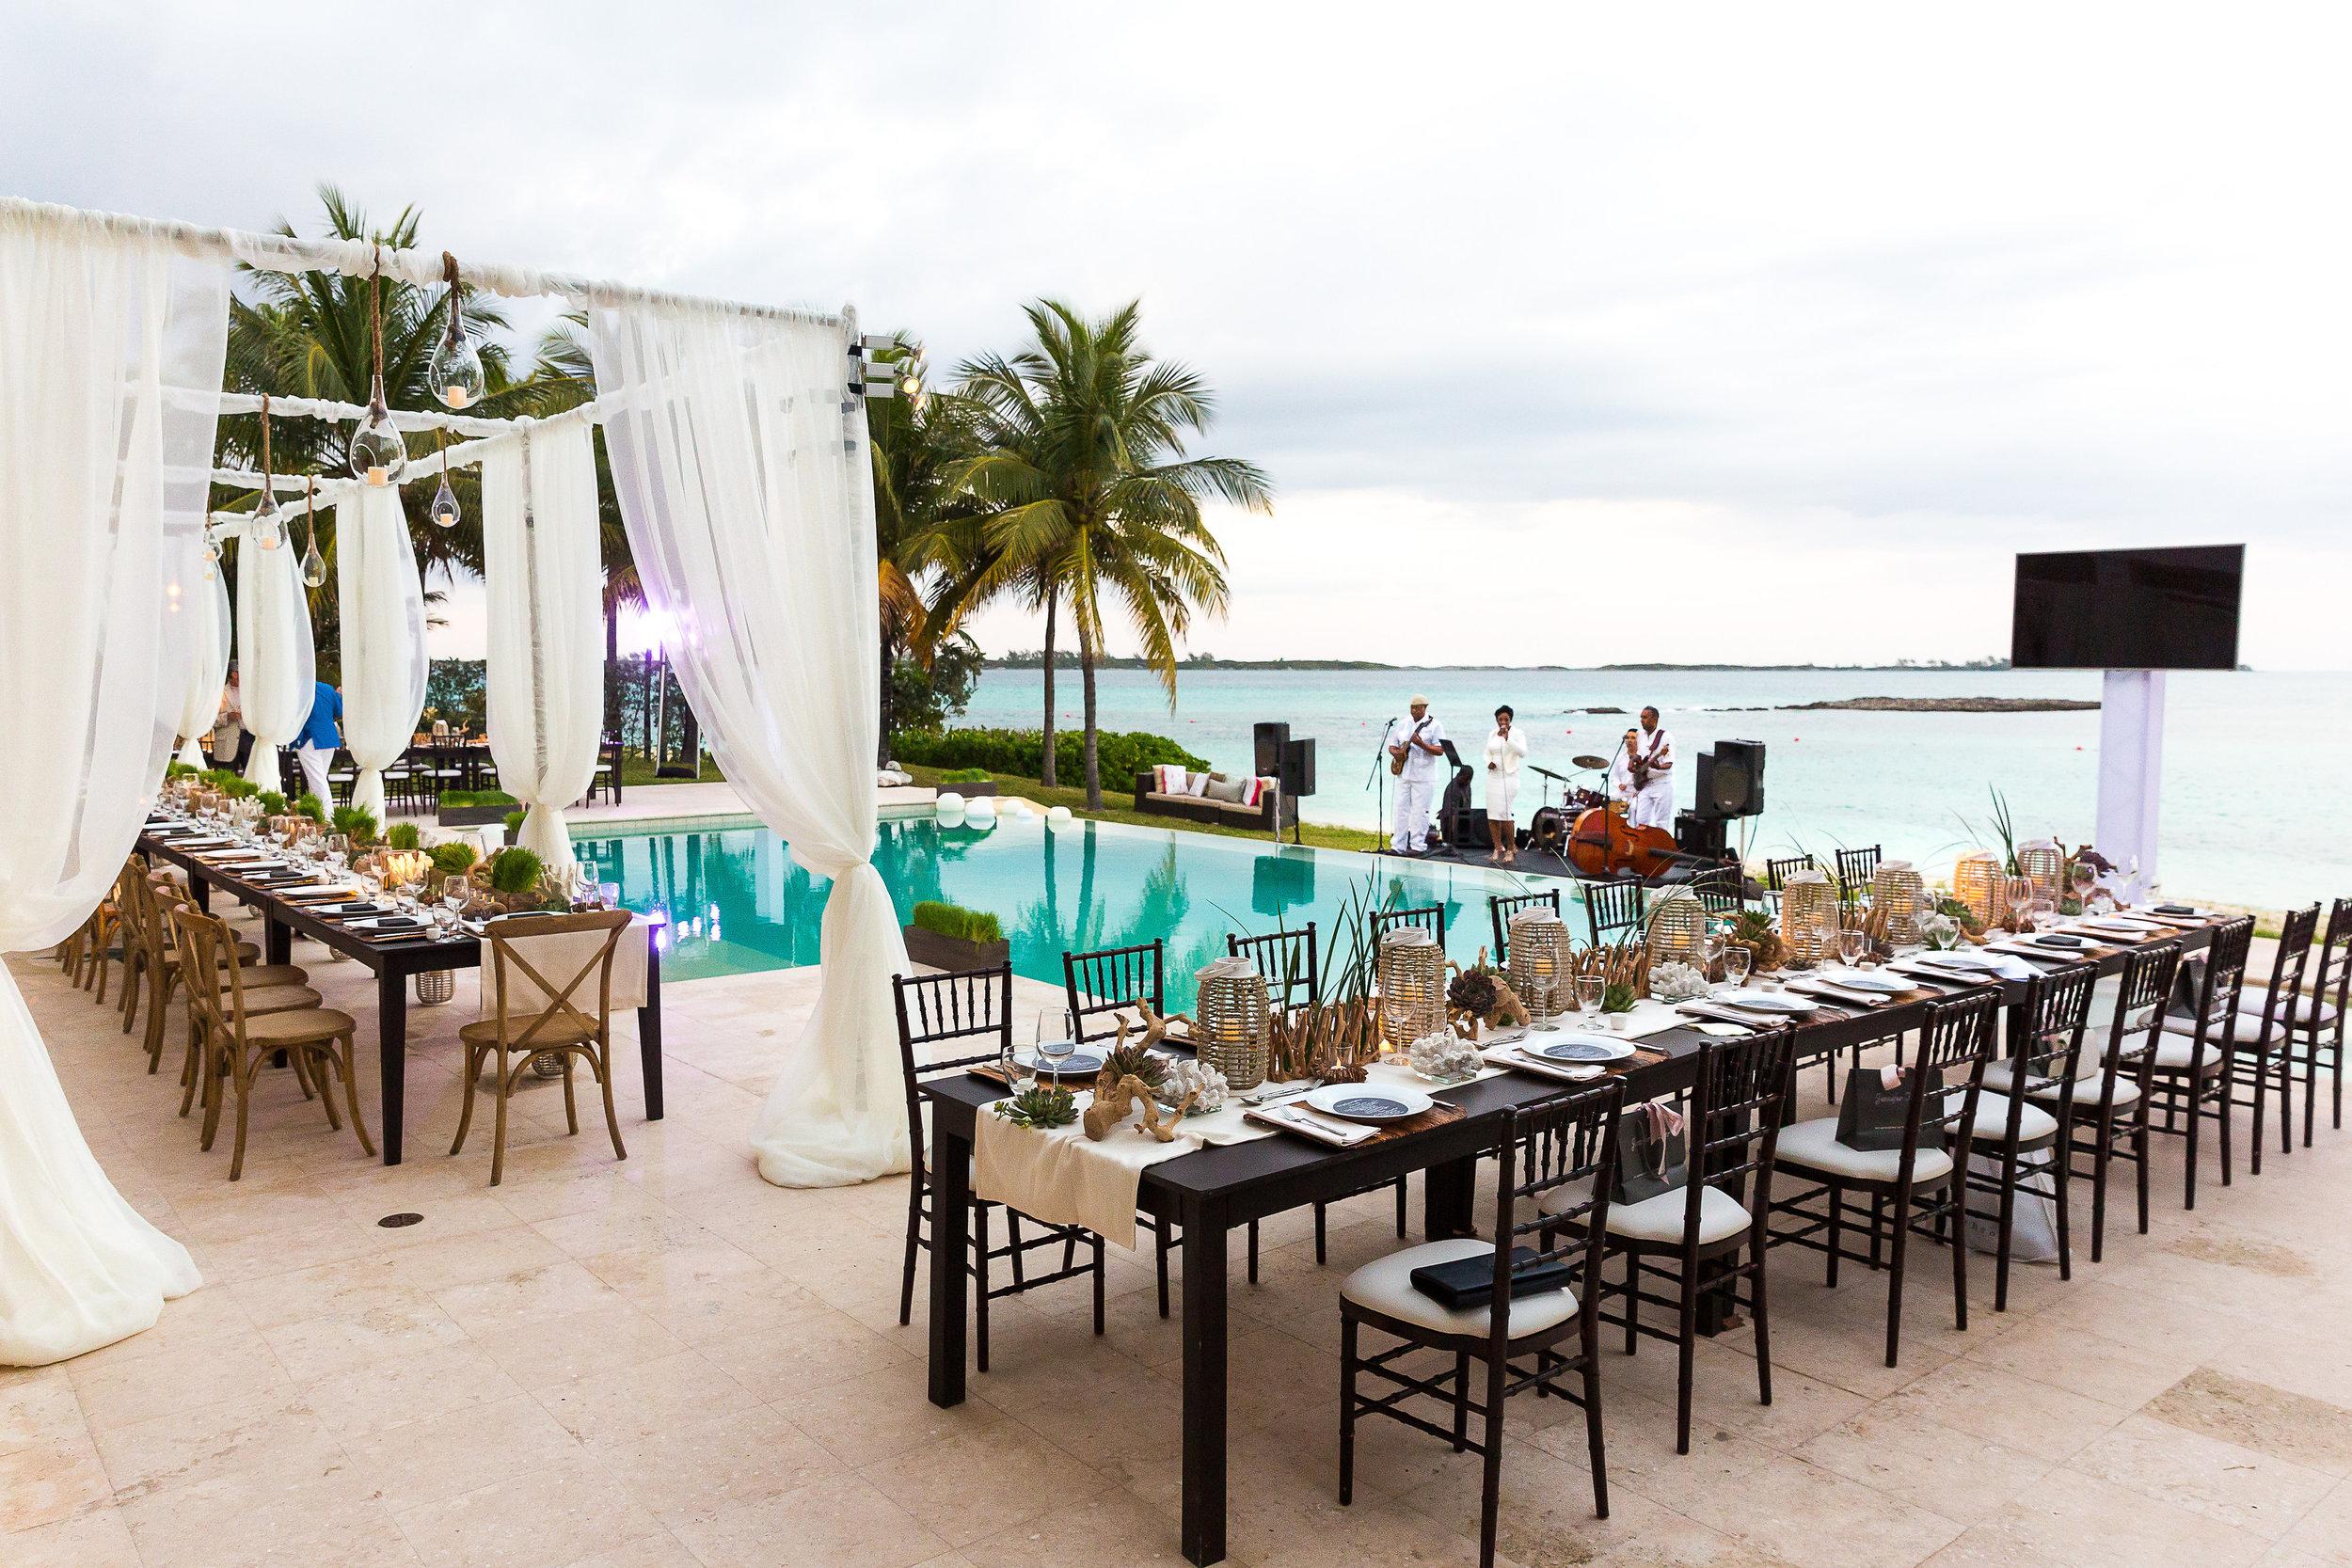 Ceci_New_York_Ceci_Style_Ceci_Johnson_Luxury_Lifestyle_Destination_Bahamas_Wedding_Letterpress_Inspiration_Design_Custom_Couture_Personalized_Invitations_10.jpg